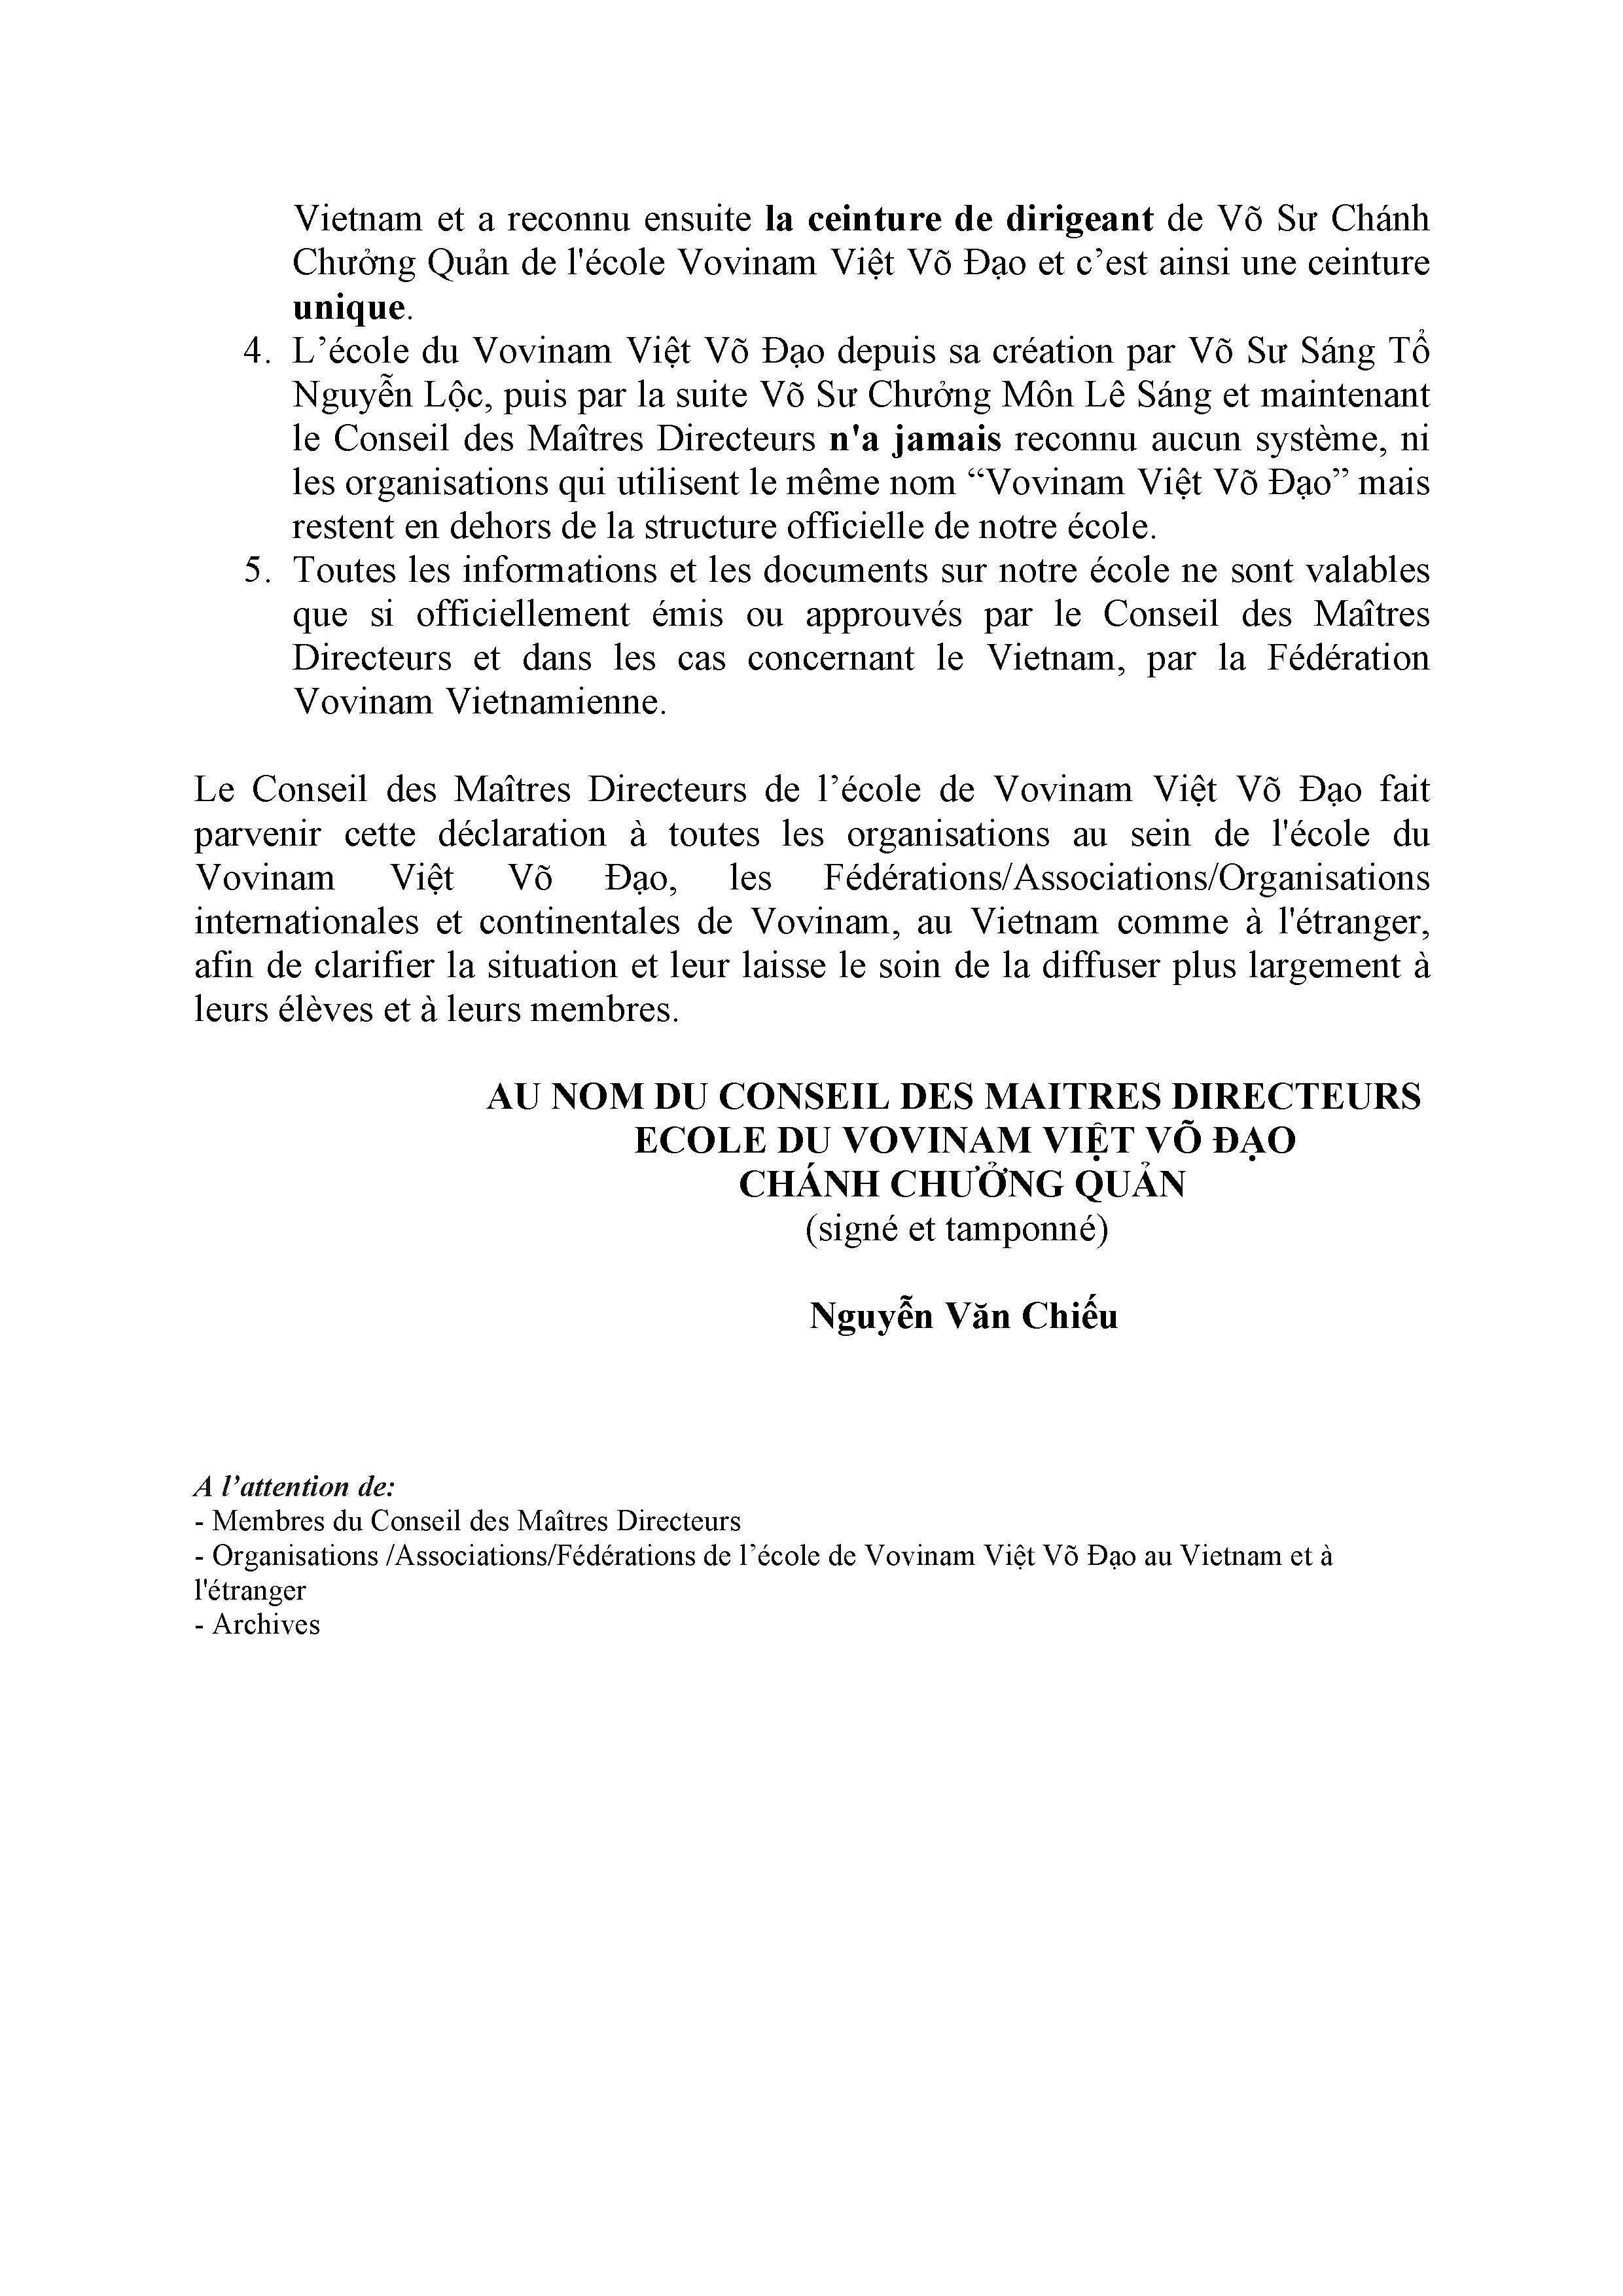 CAO TRI HDVSCQMP 2016 - DECLARATION-page 006